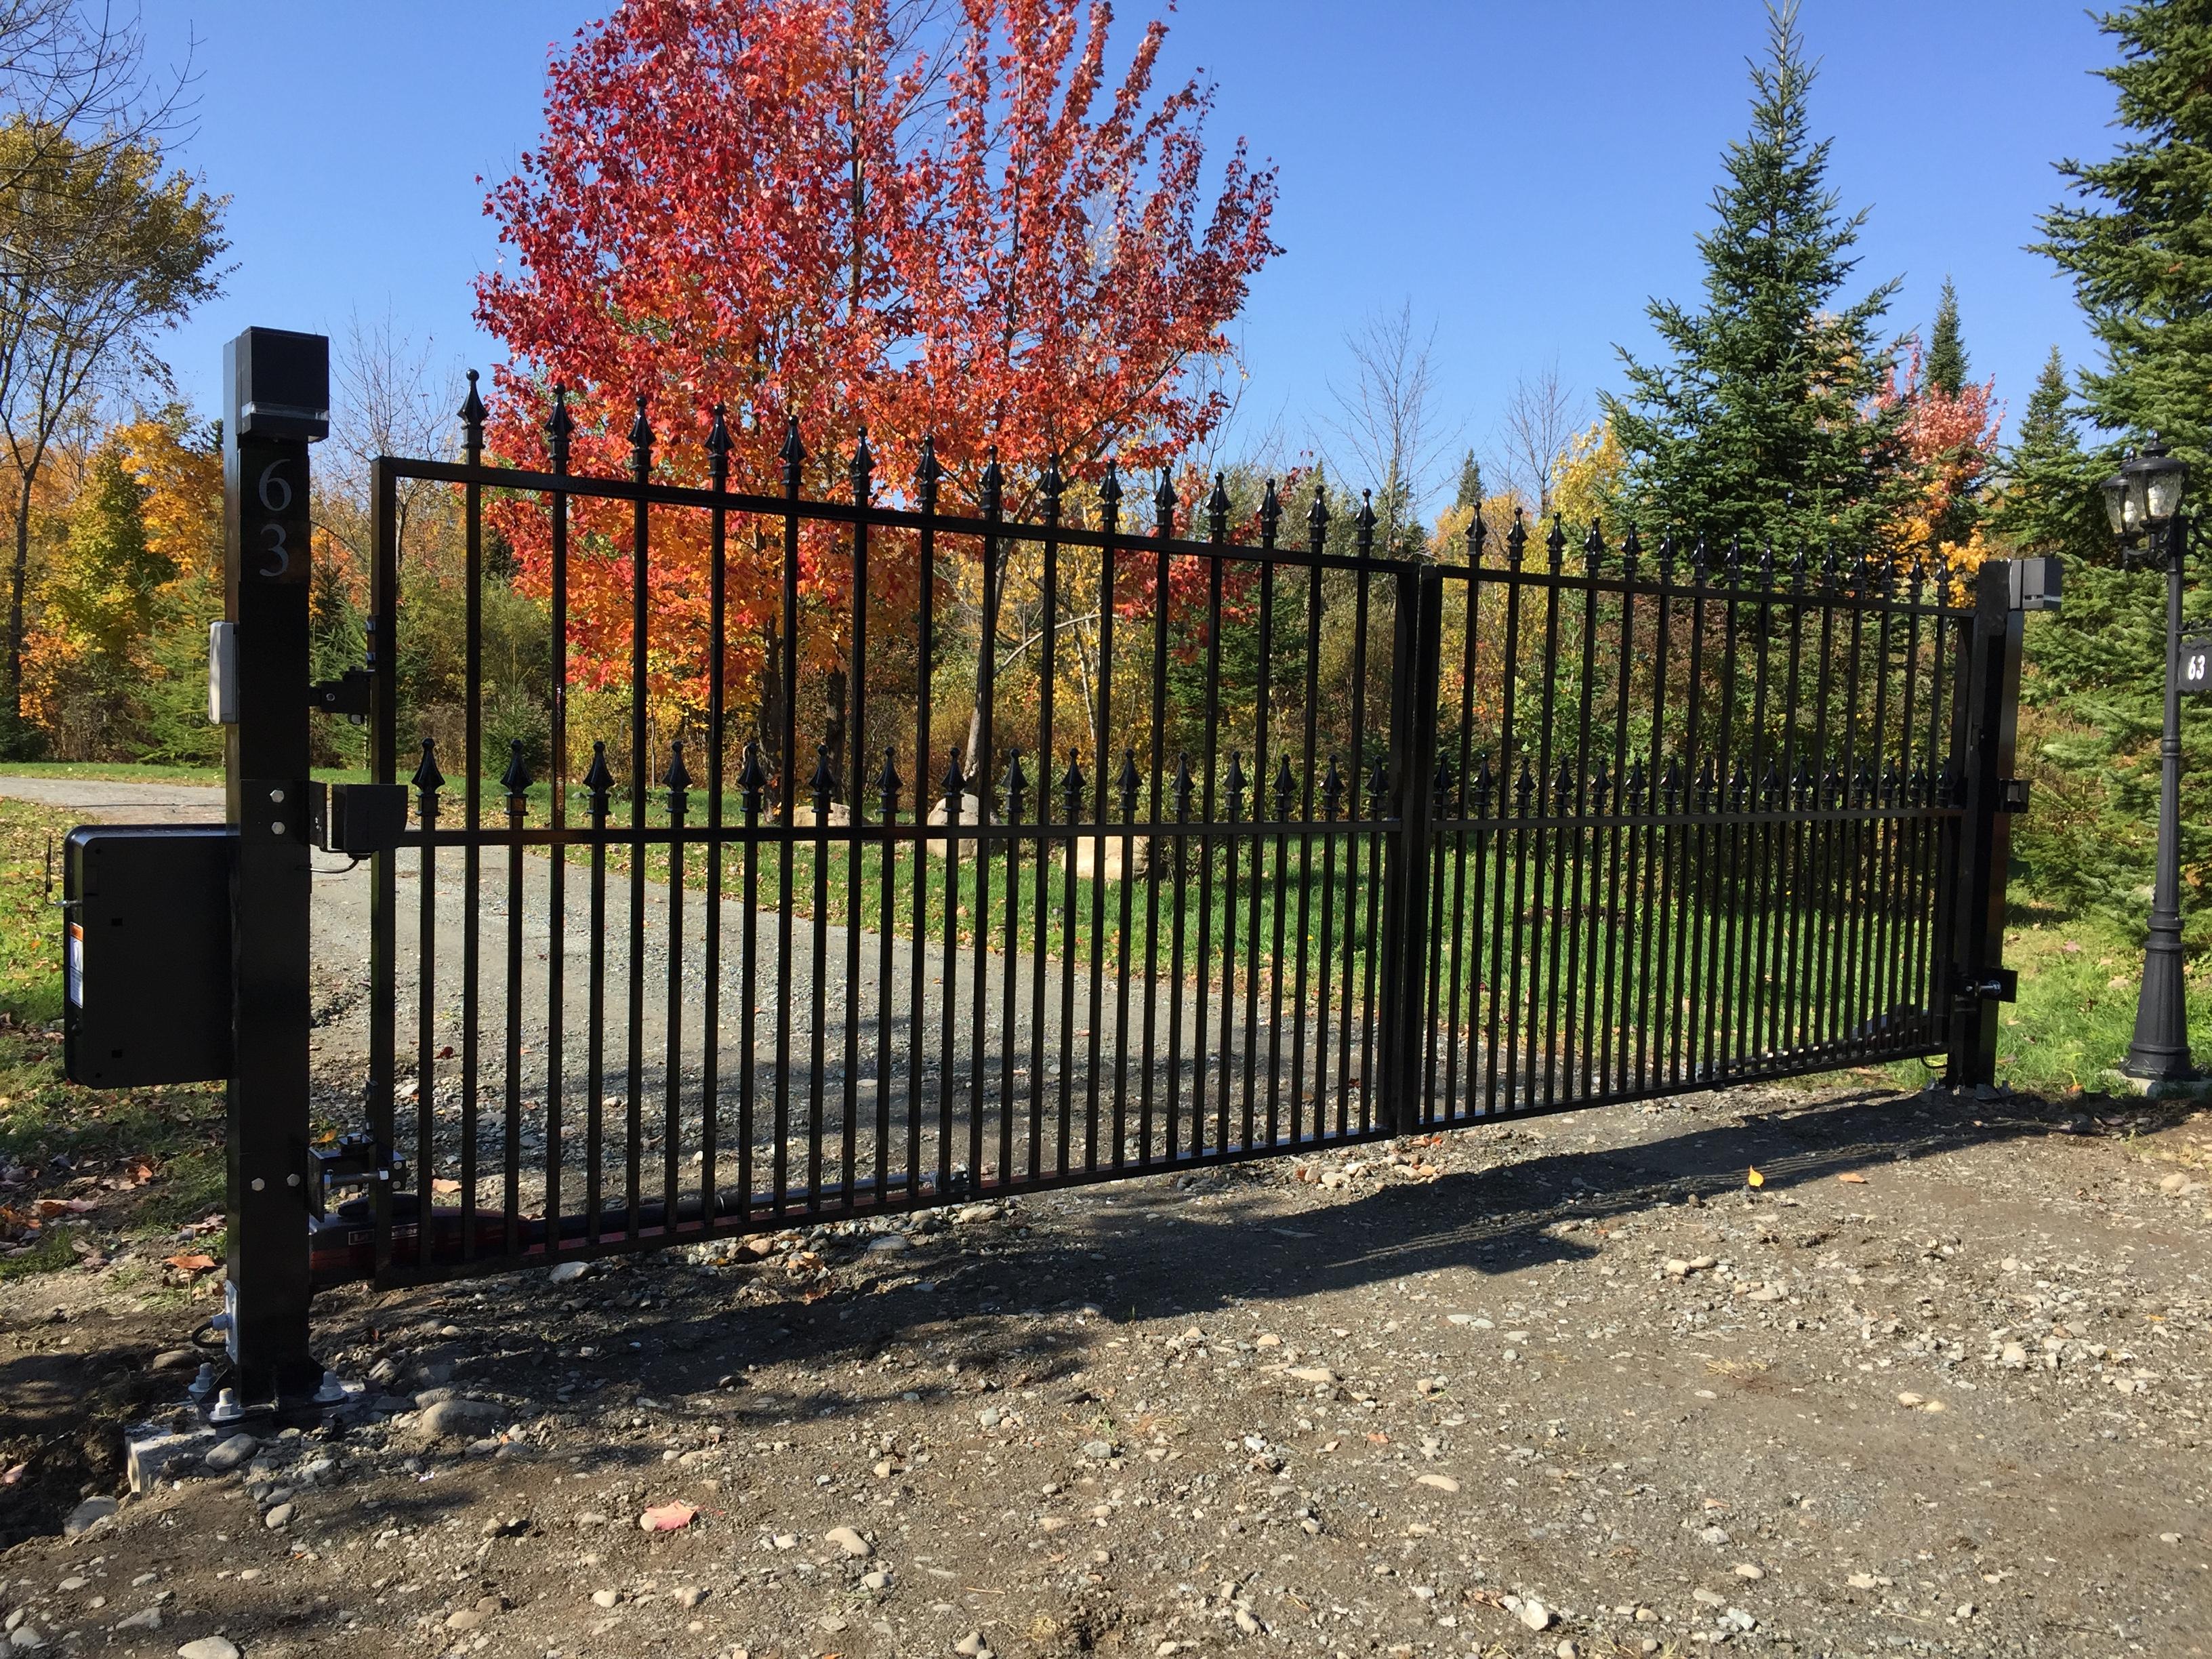 #64 | Posts gate